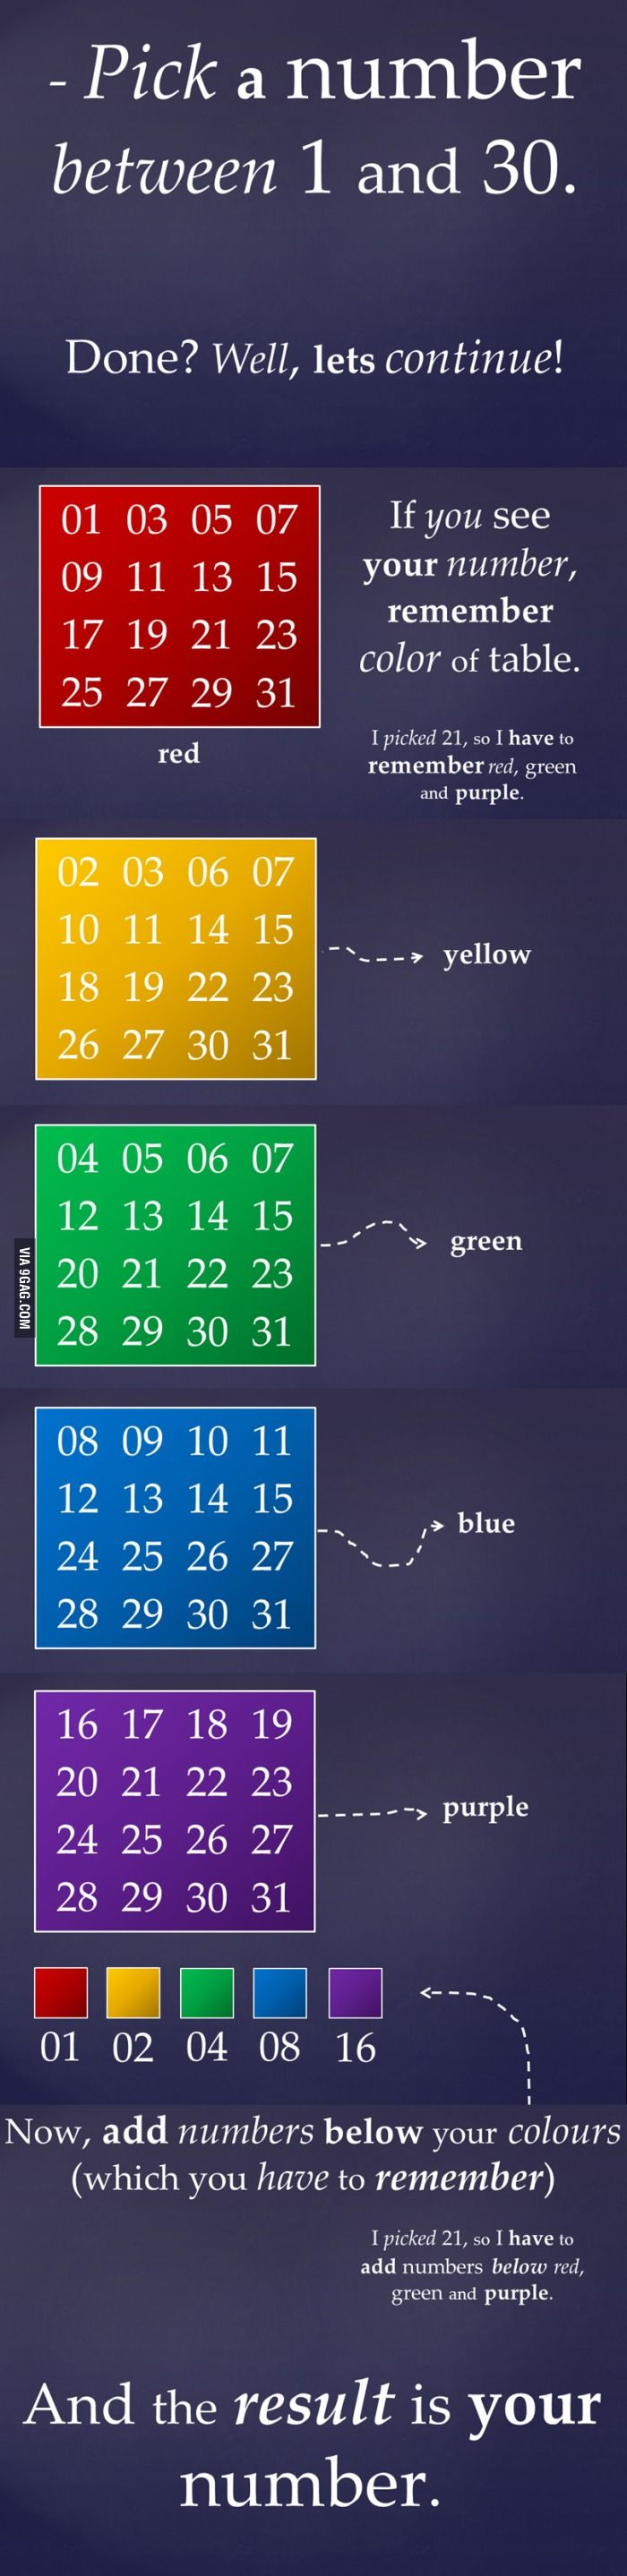 Worksheets Mind-readingnumbertrick — Mathfunfacts 68 best cool math stuff images on pinterest mathematics pick a number between 1 and 30 maths tricksbrain trickscool stuffrandom